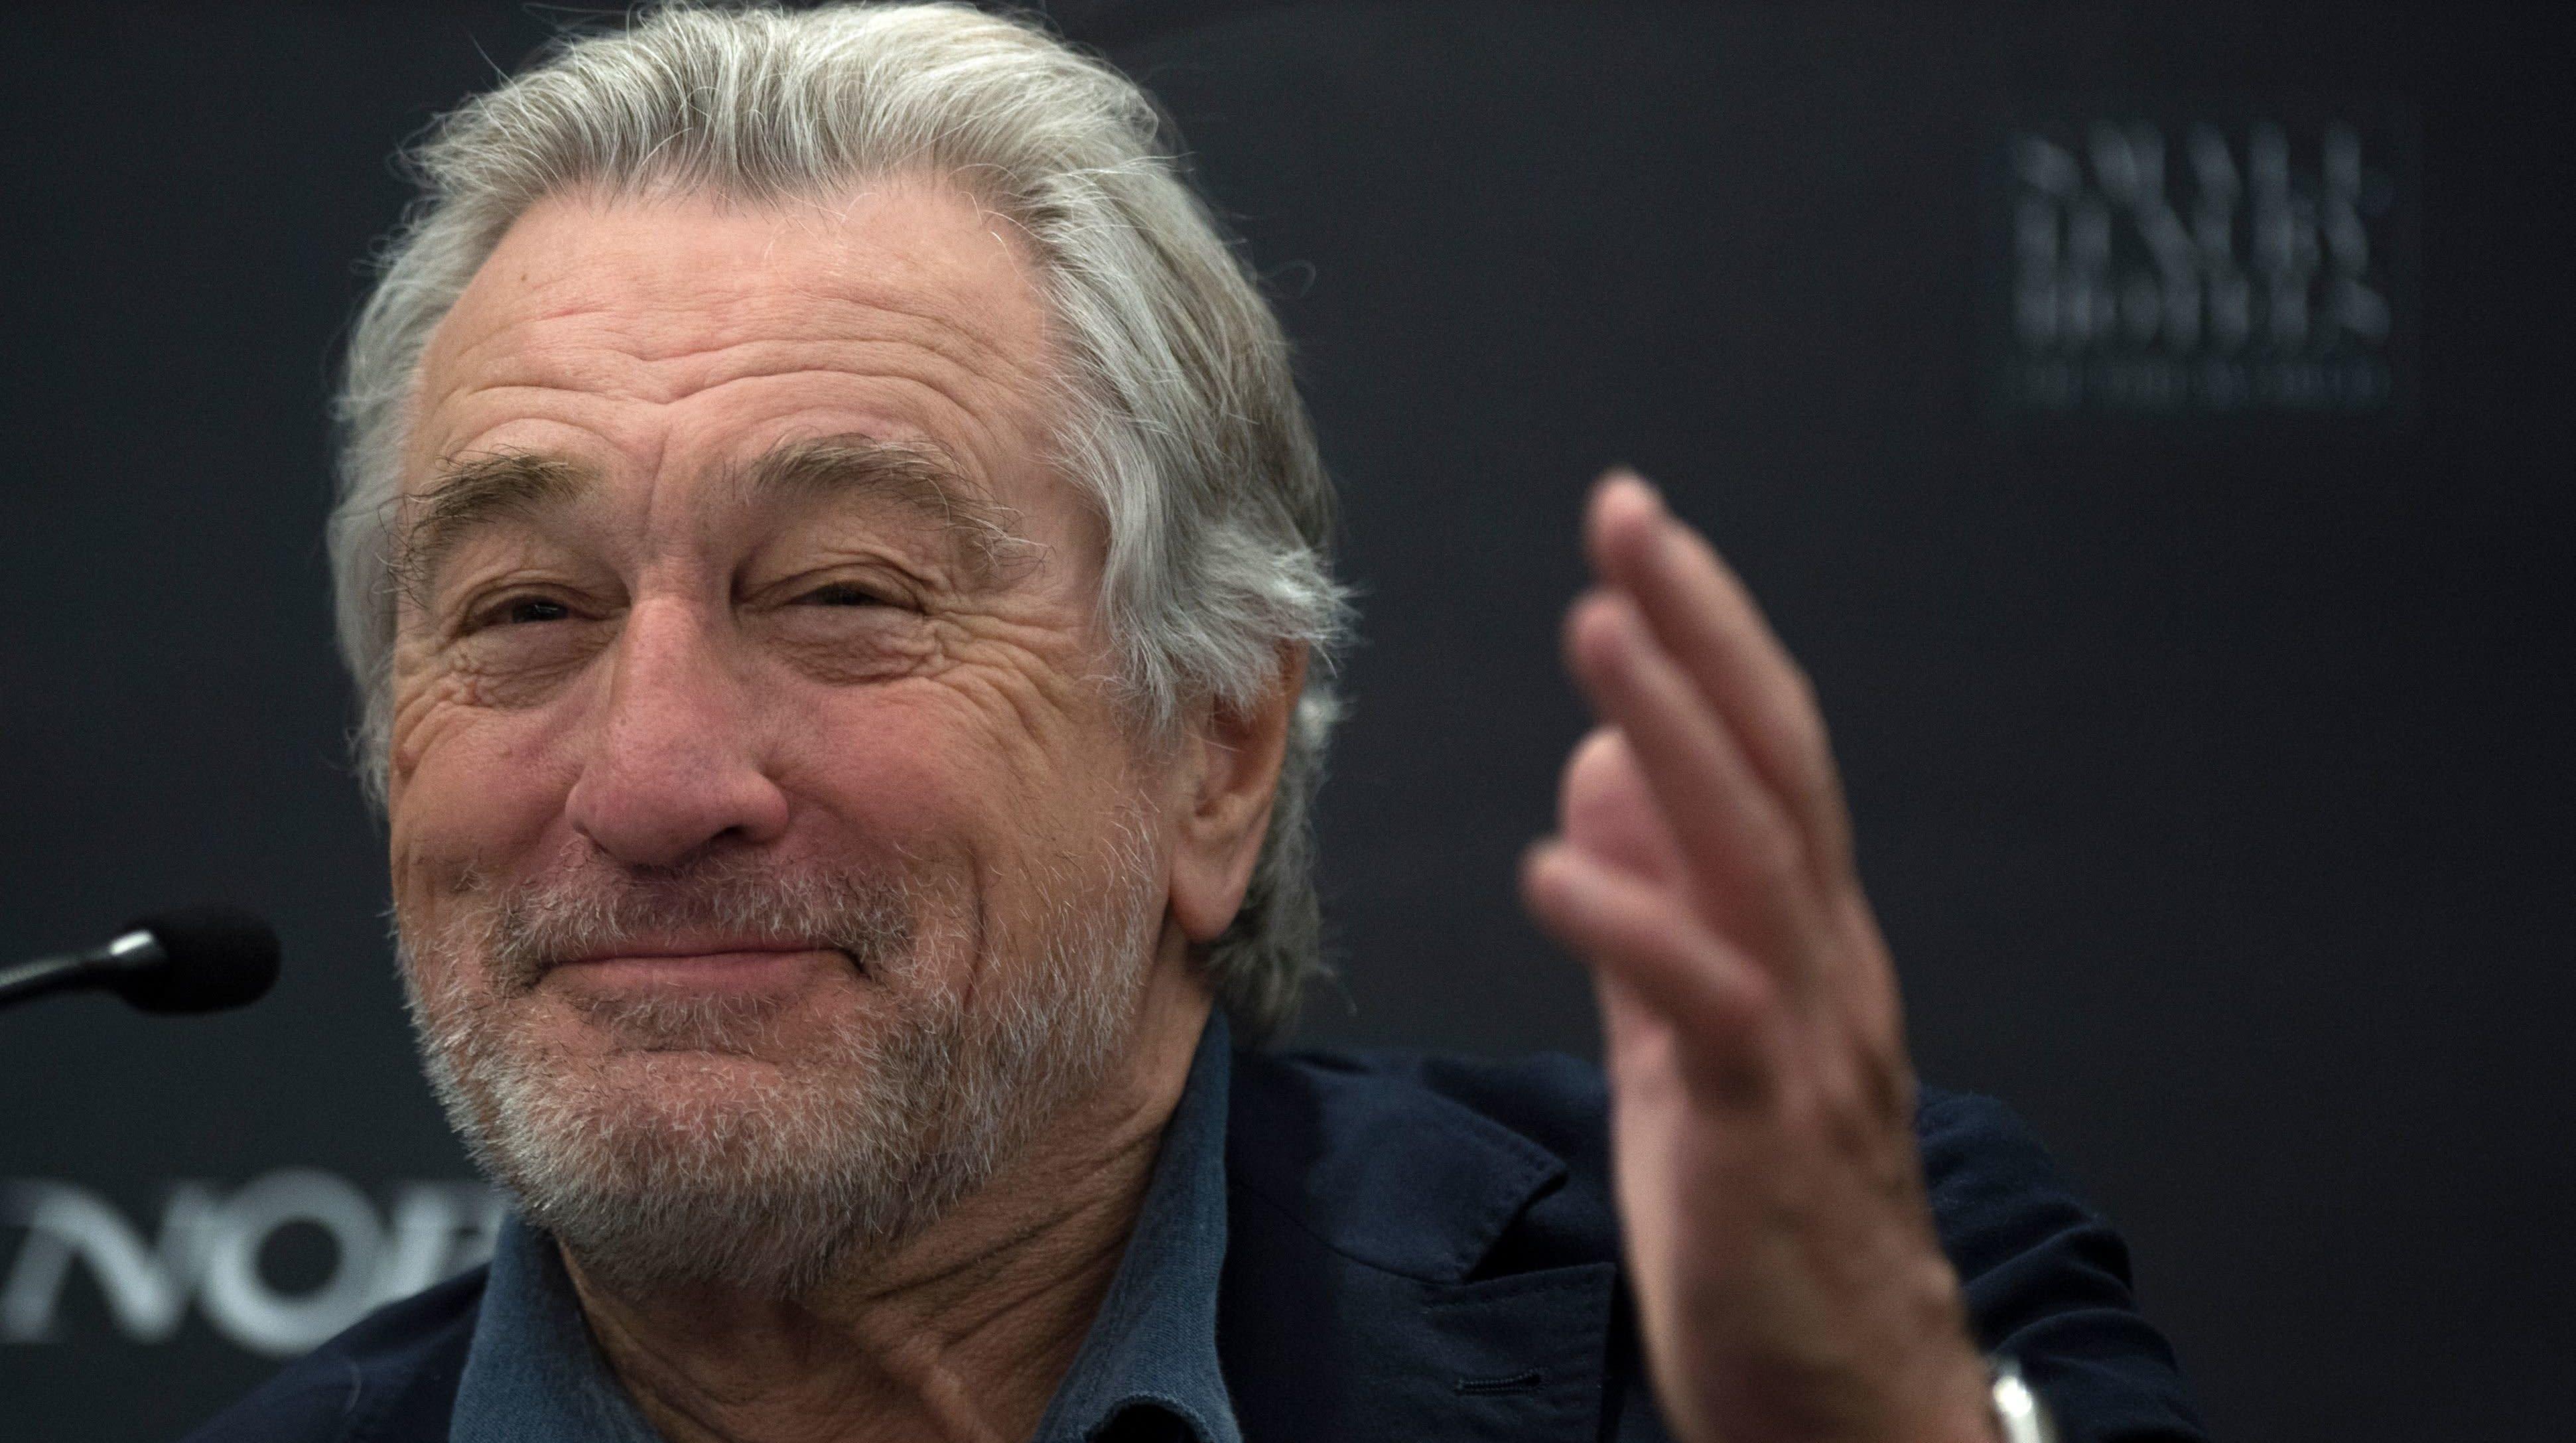 Robert De Niro Bans Trump From Every Nobu Restaurant